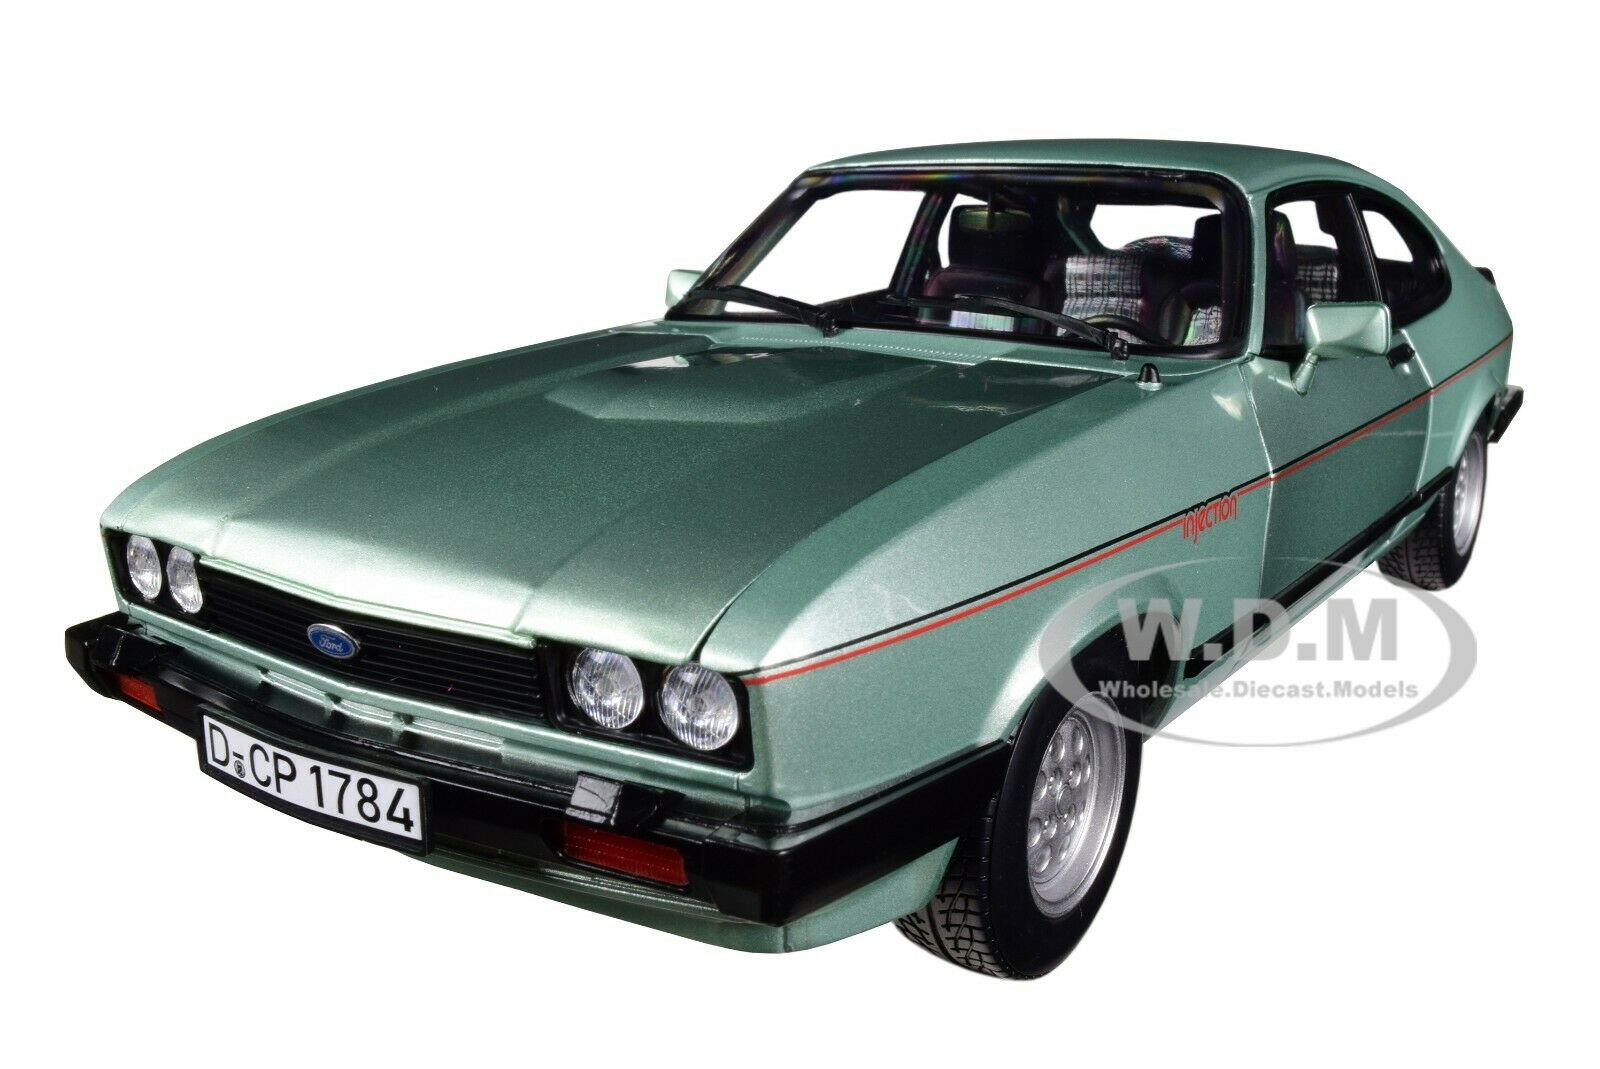 III 2,8 Injection 1982 Crystal Green Metallic 1:18 Norev Ford Capri Mk